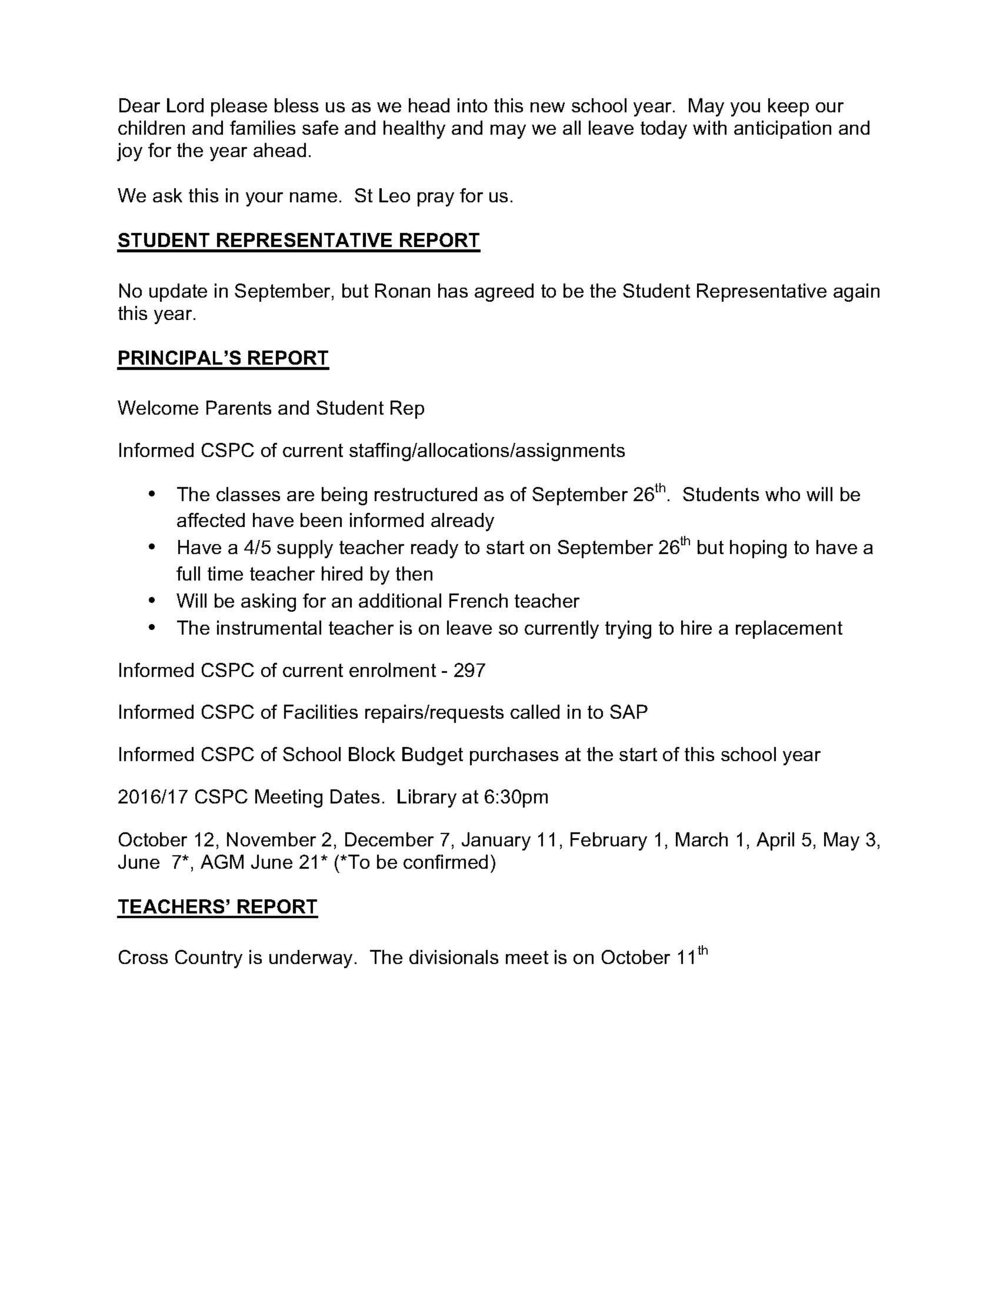 20160921_CSPC Minutes_Page_2.jpg